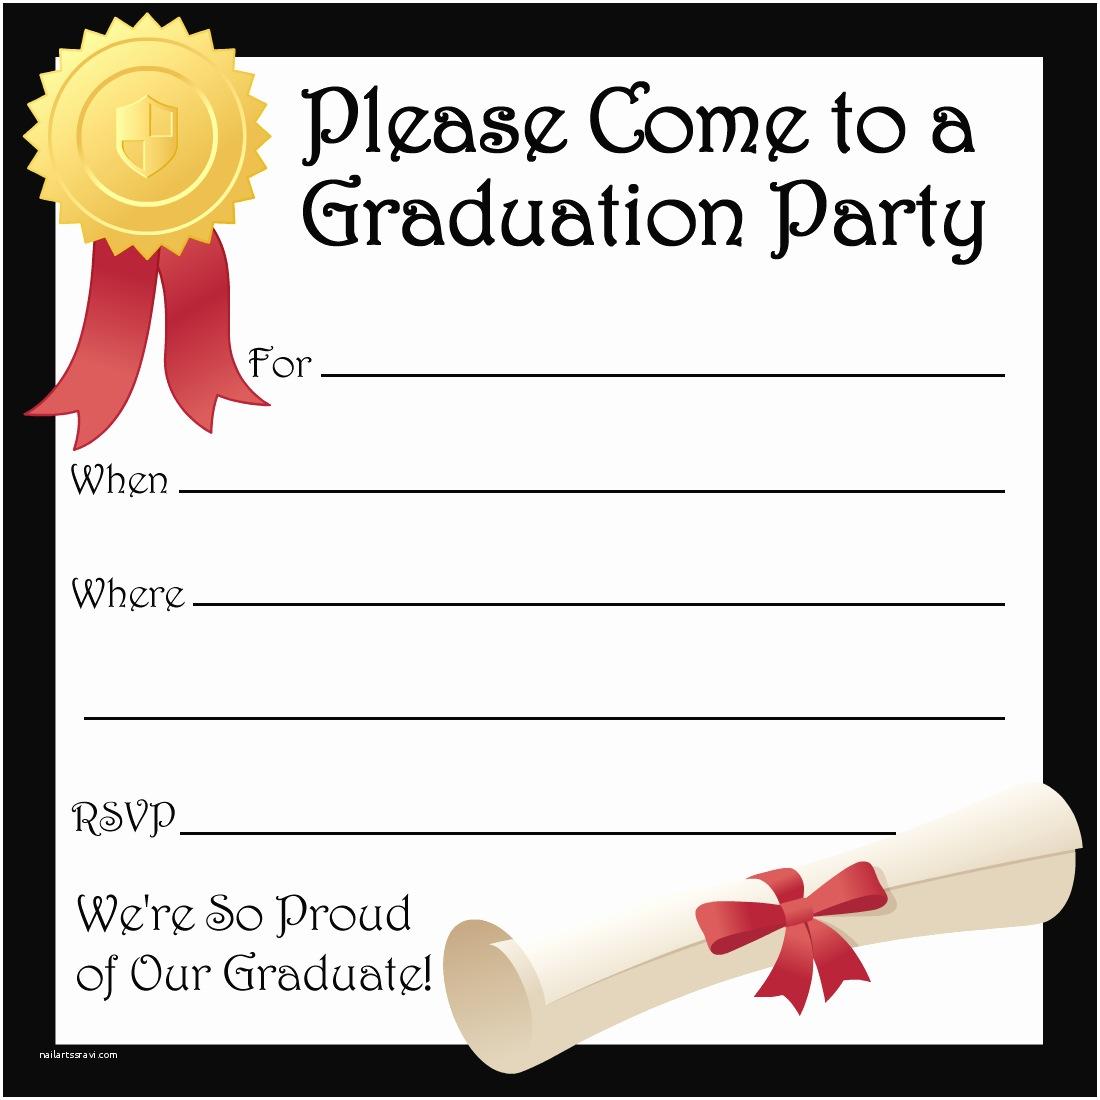 College Graduation Party Invitations Free Printable Graduation Party Invitations